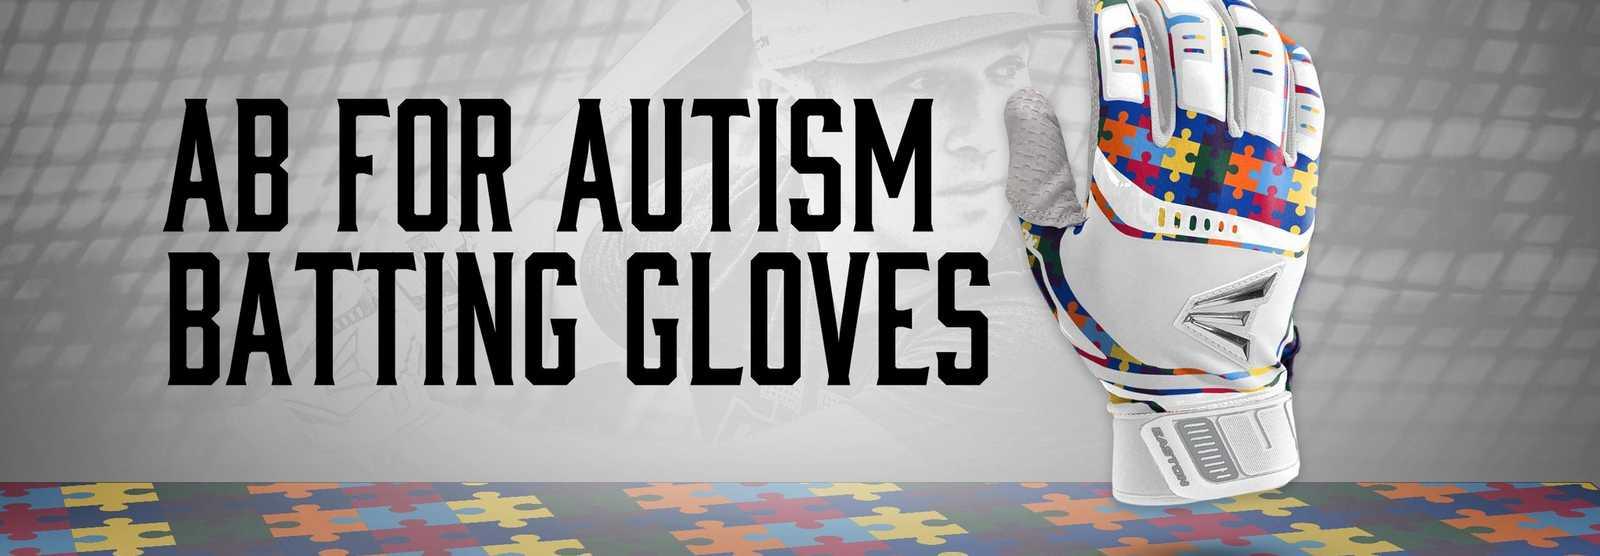 alex-bregman-austim-awareness-batting-gloves